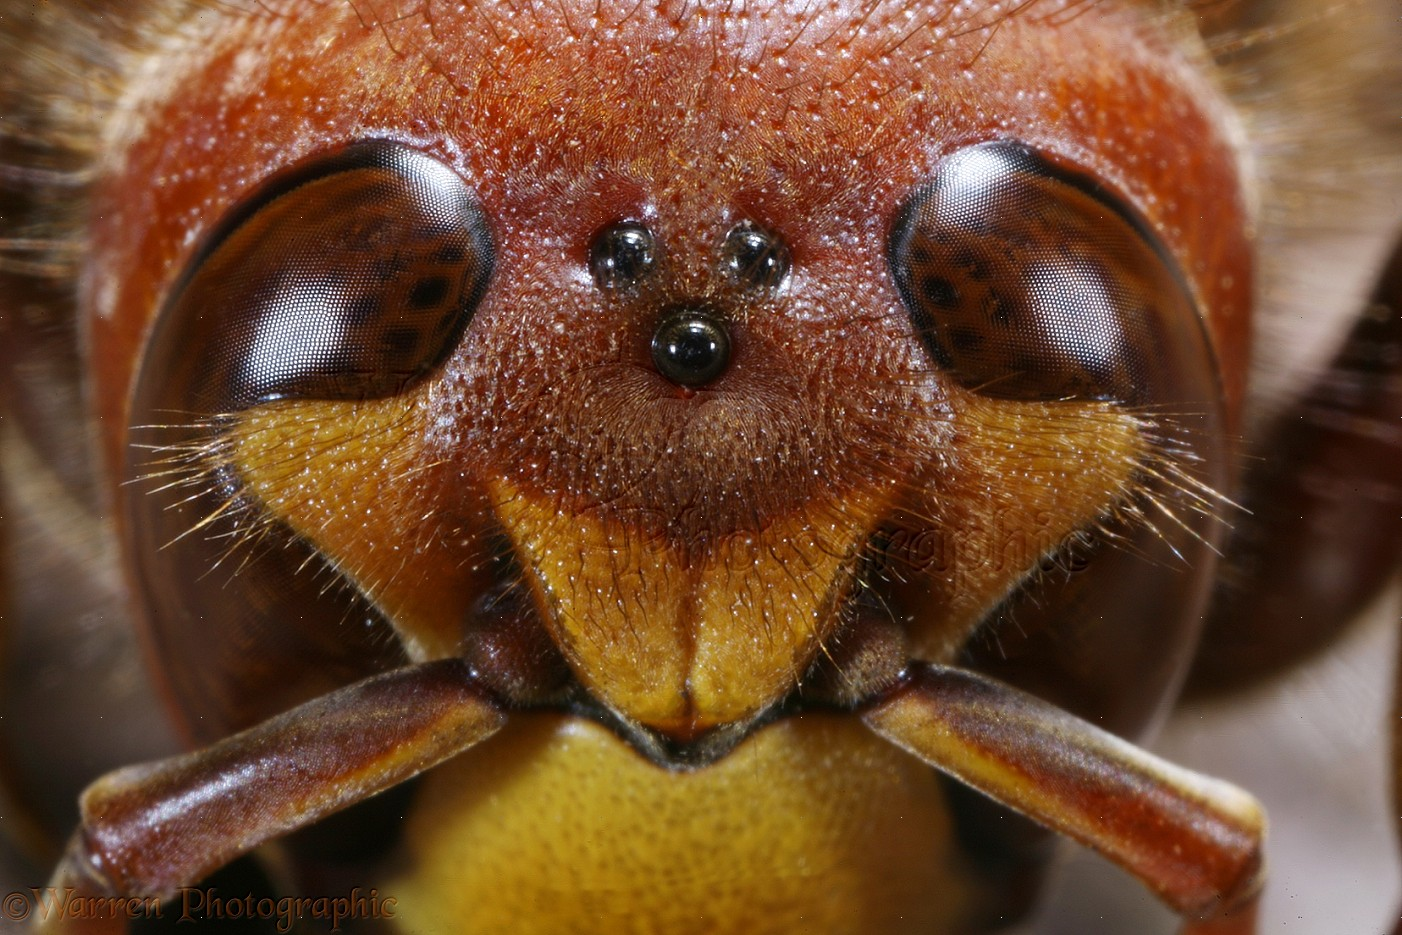 WP14973 European Hornet   Vespa crabro   head of queen showing ocelli